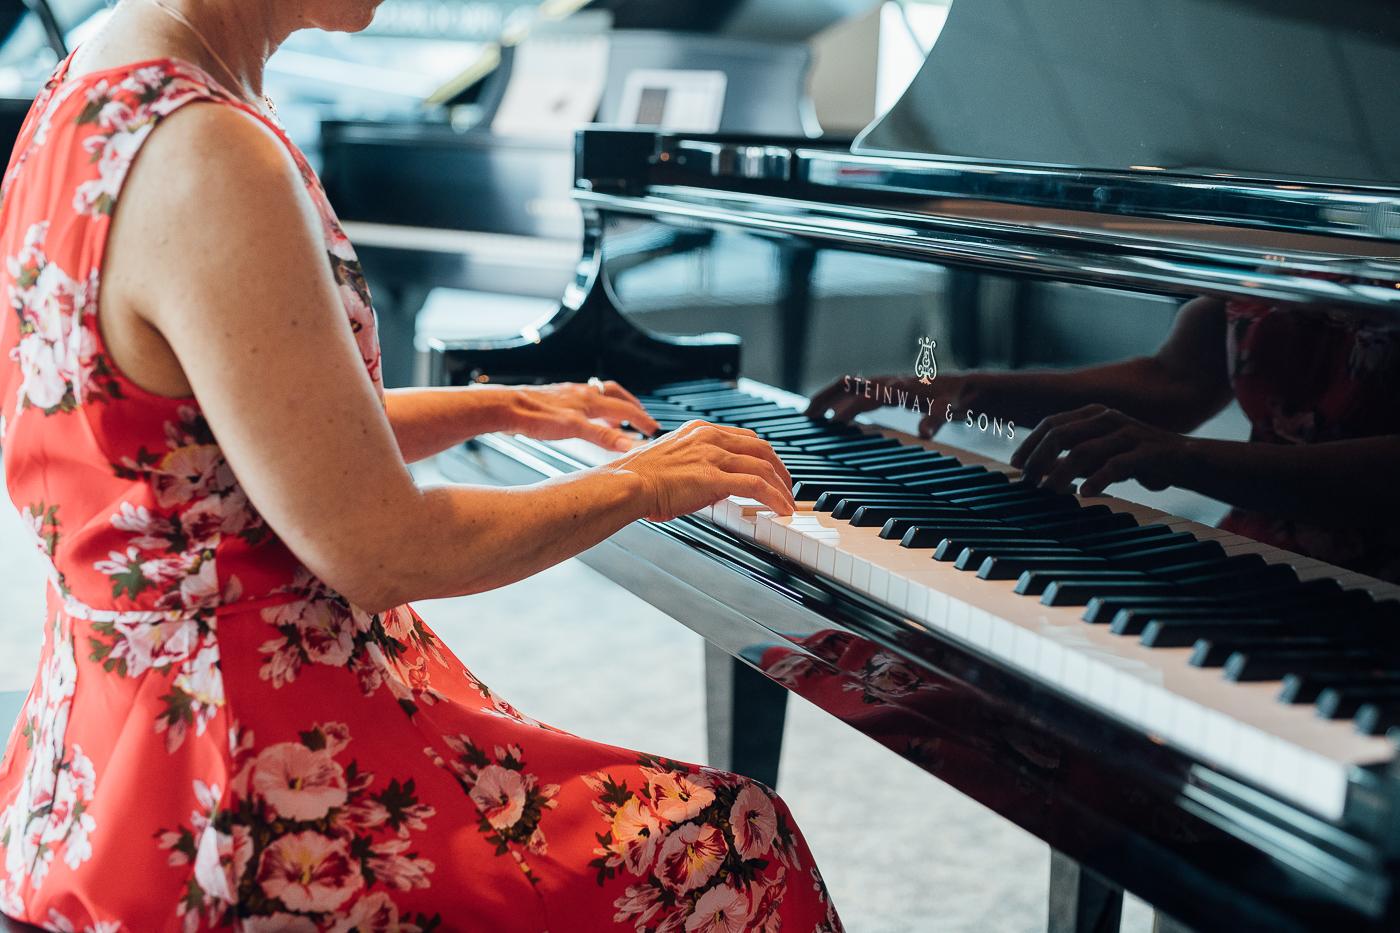 Piano Recital Resized for Web-57